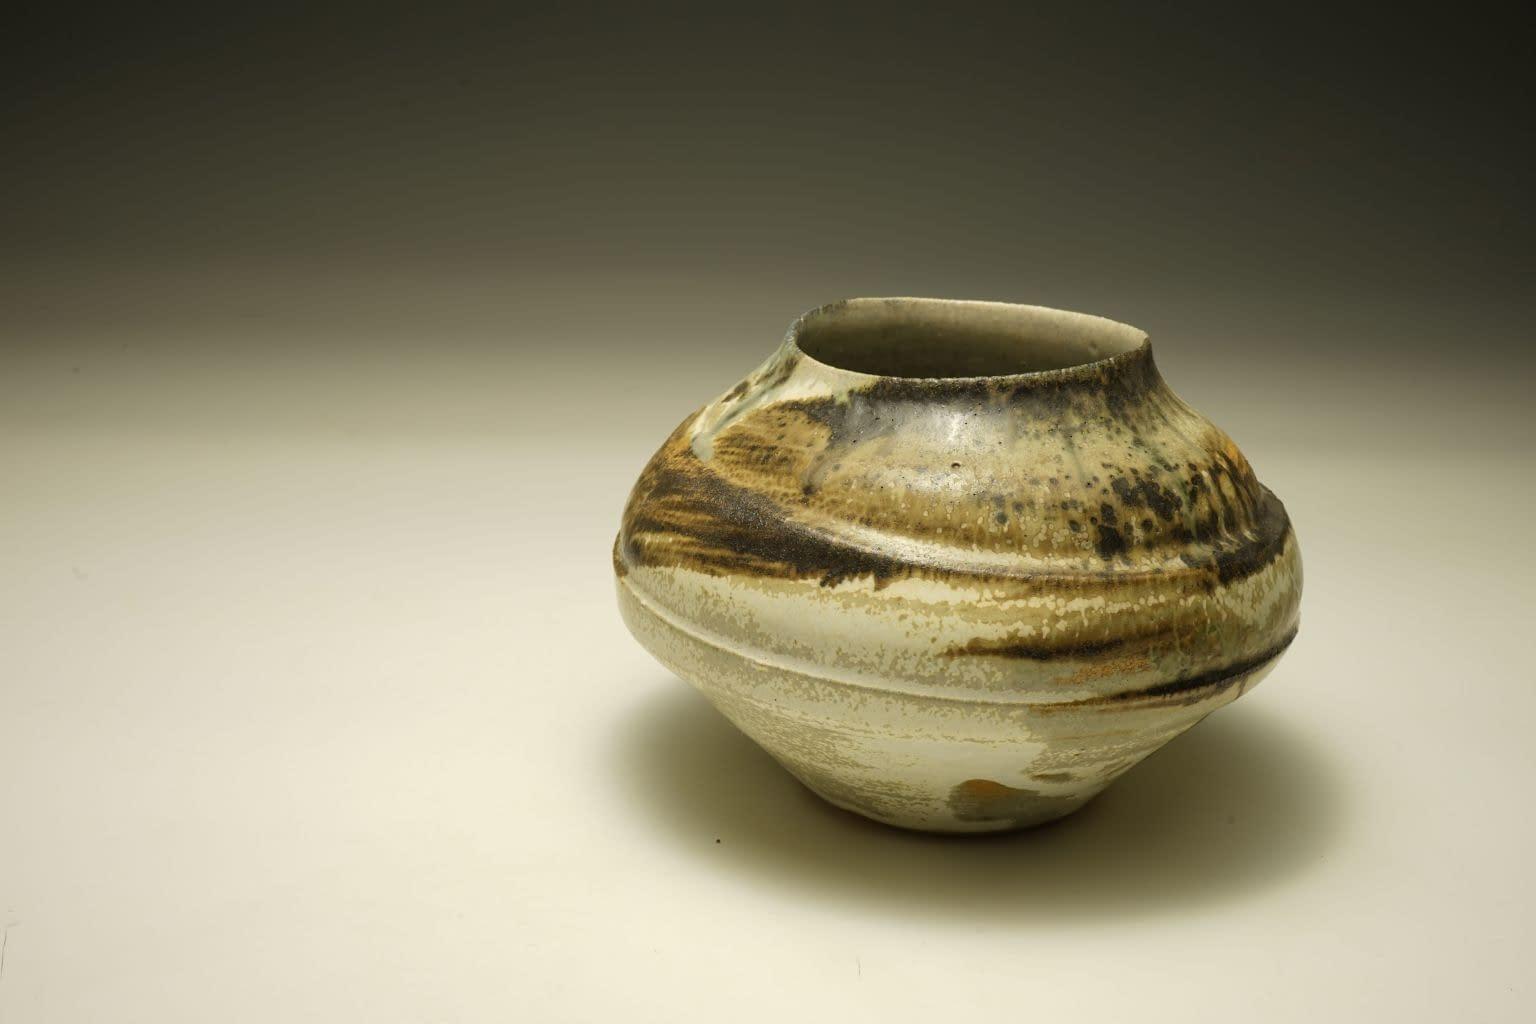 Abstract stoneware vase